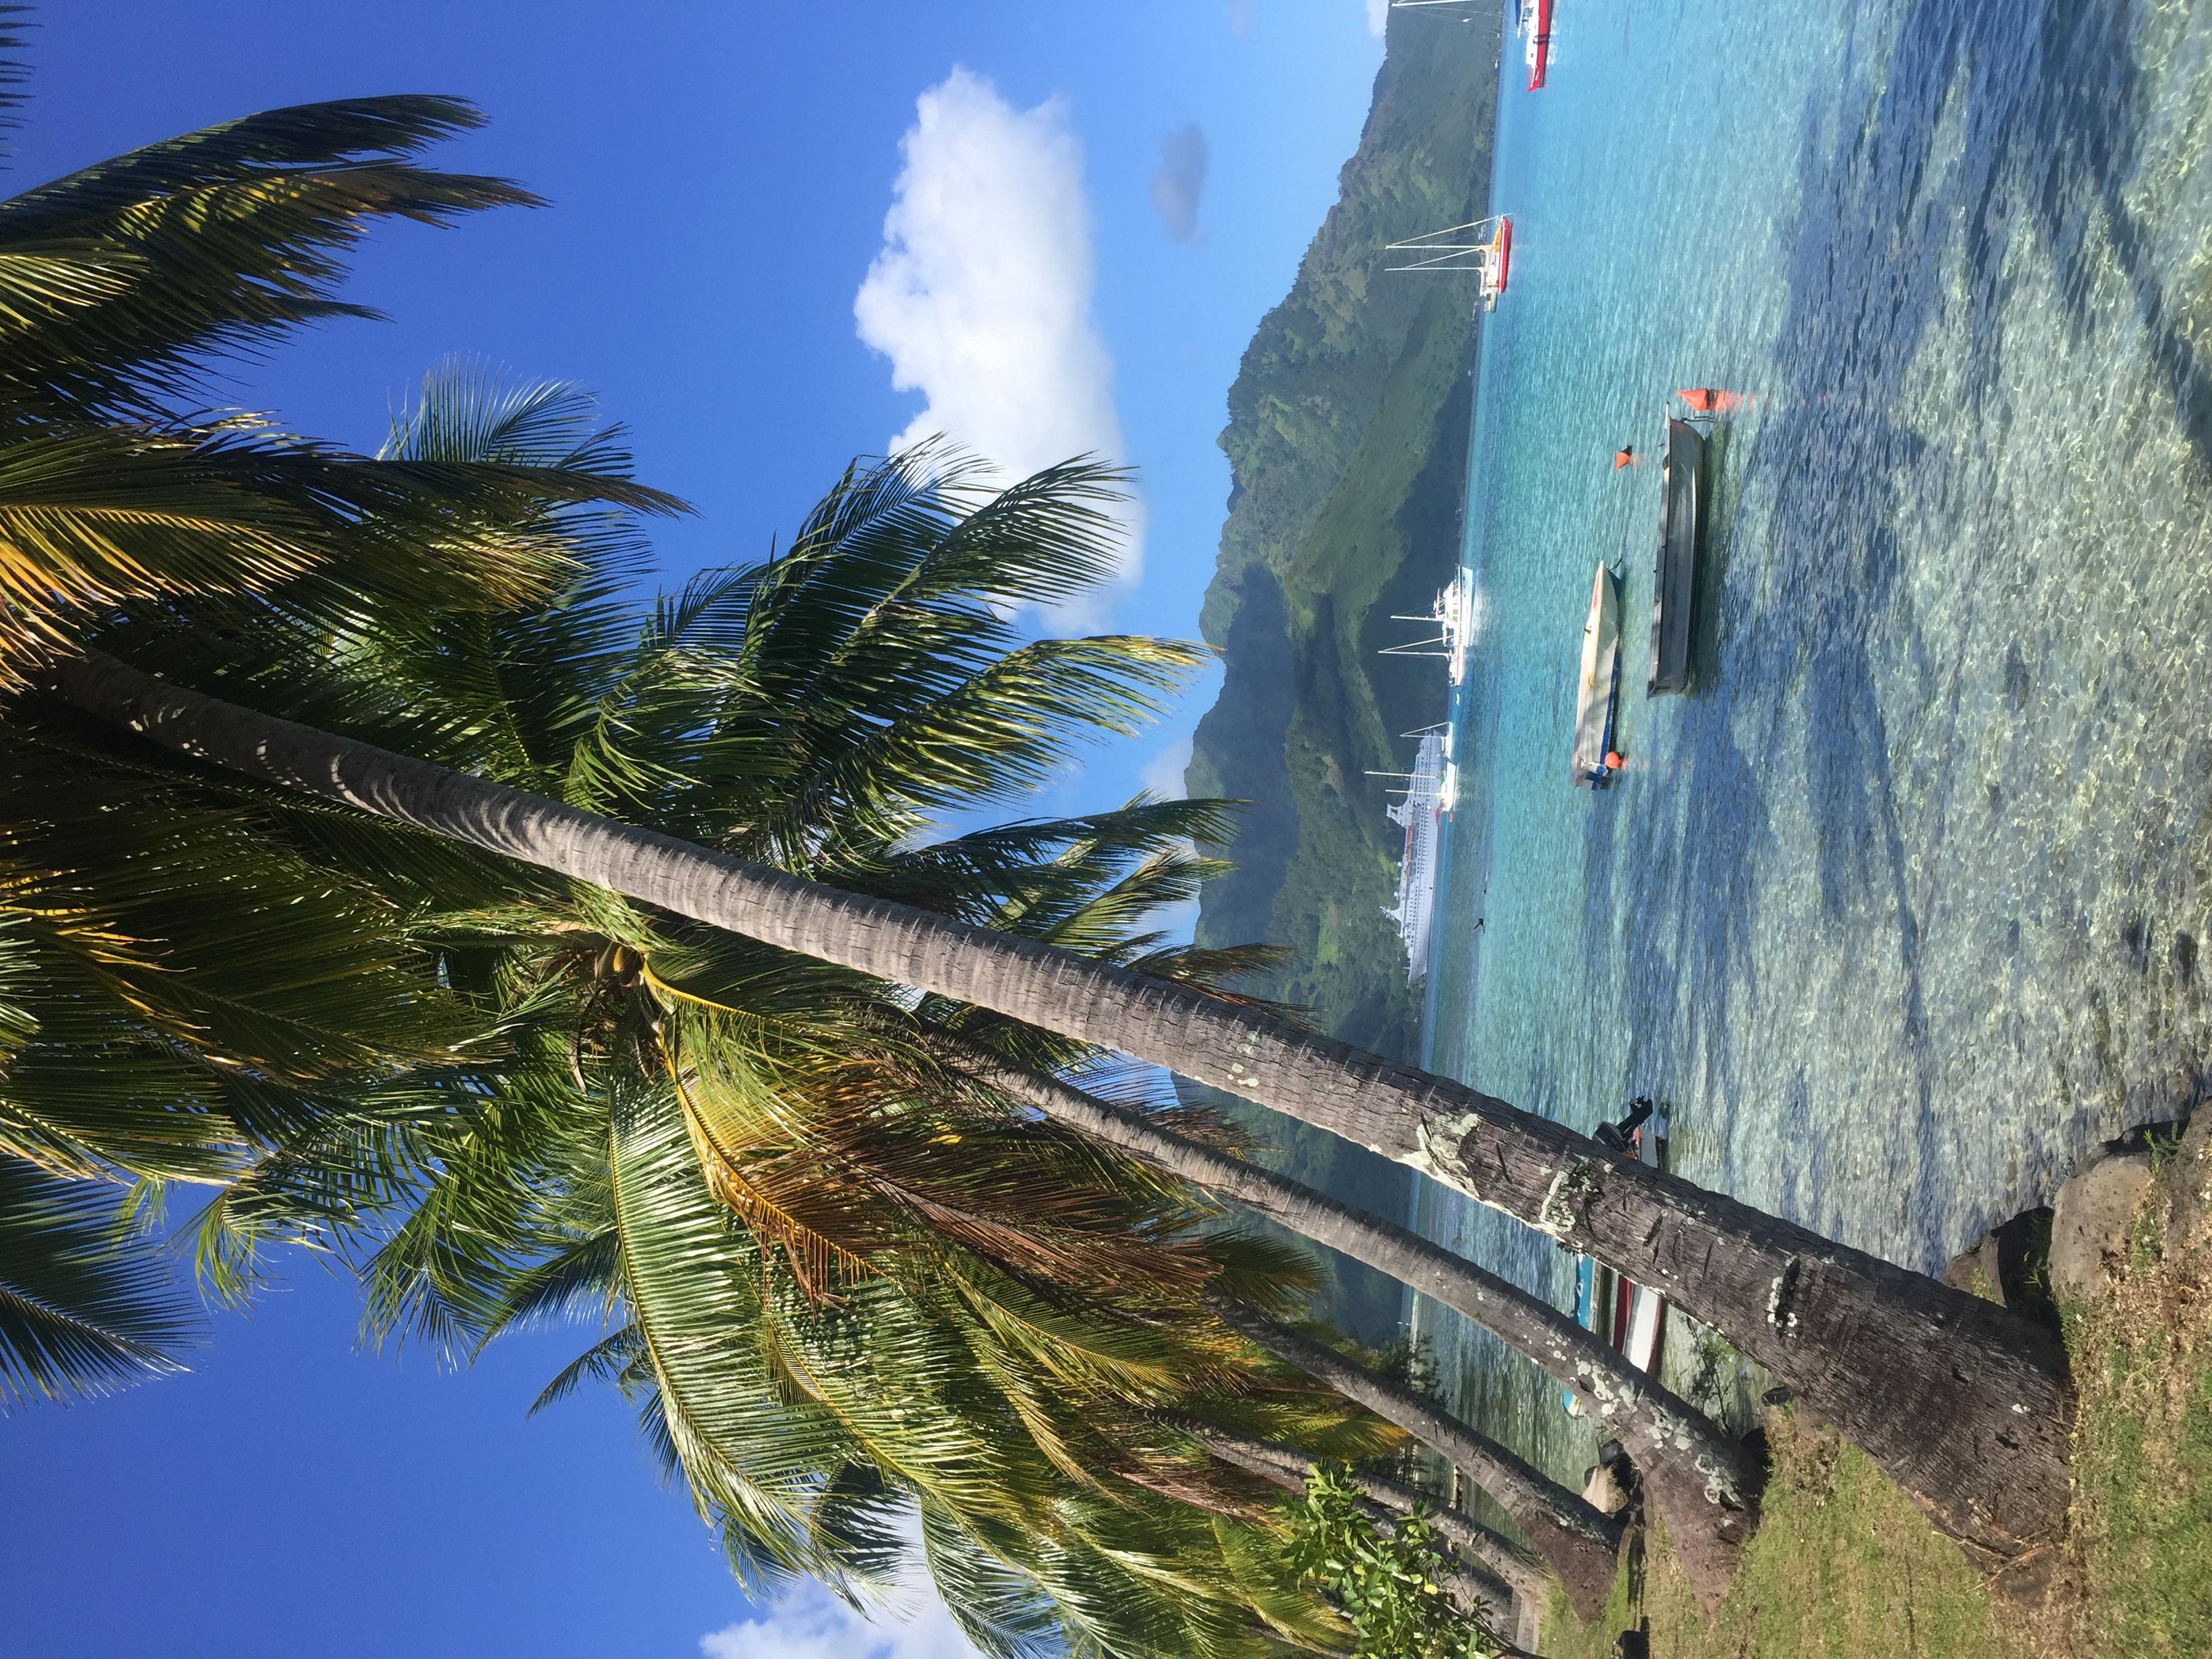 voyage-polynesie-francaise-aventure